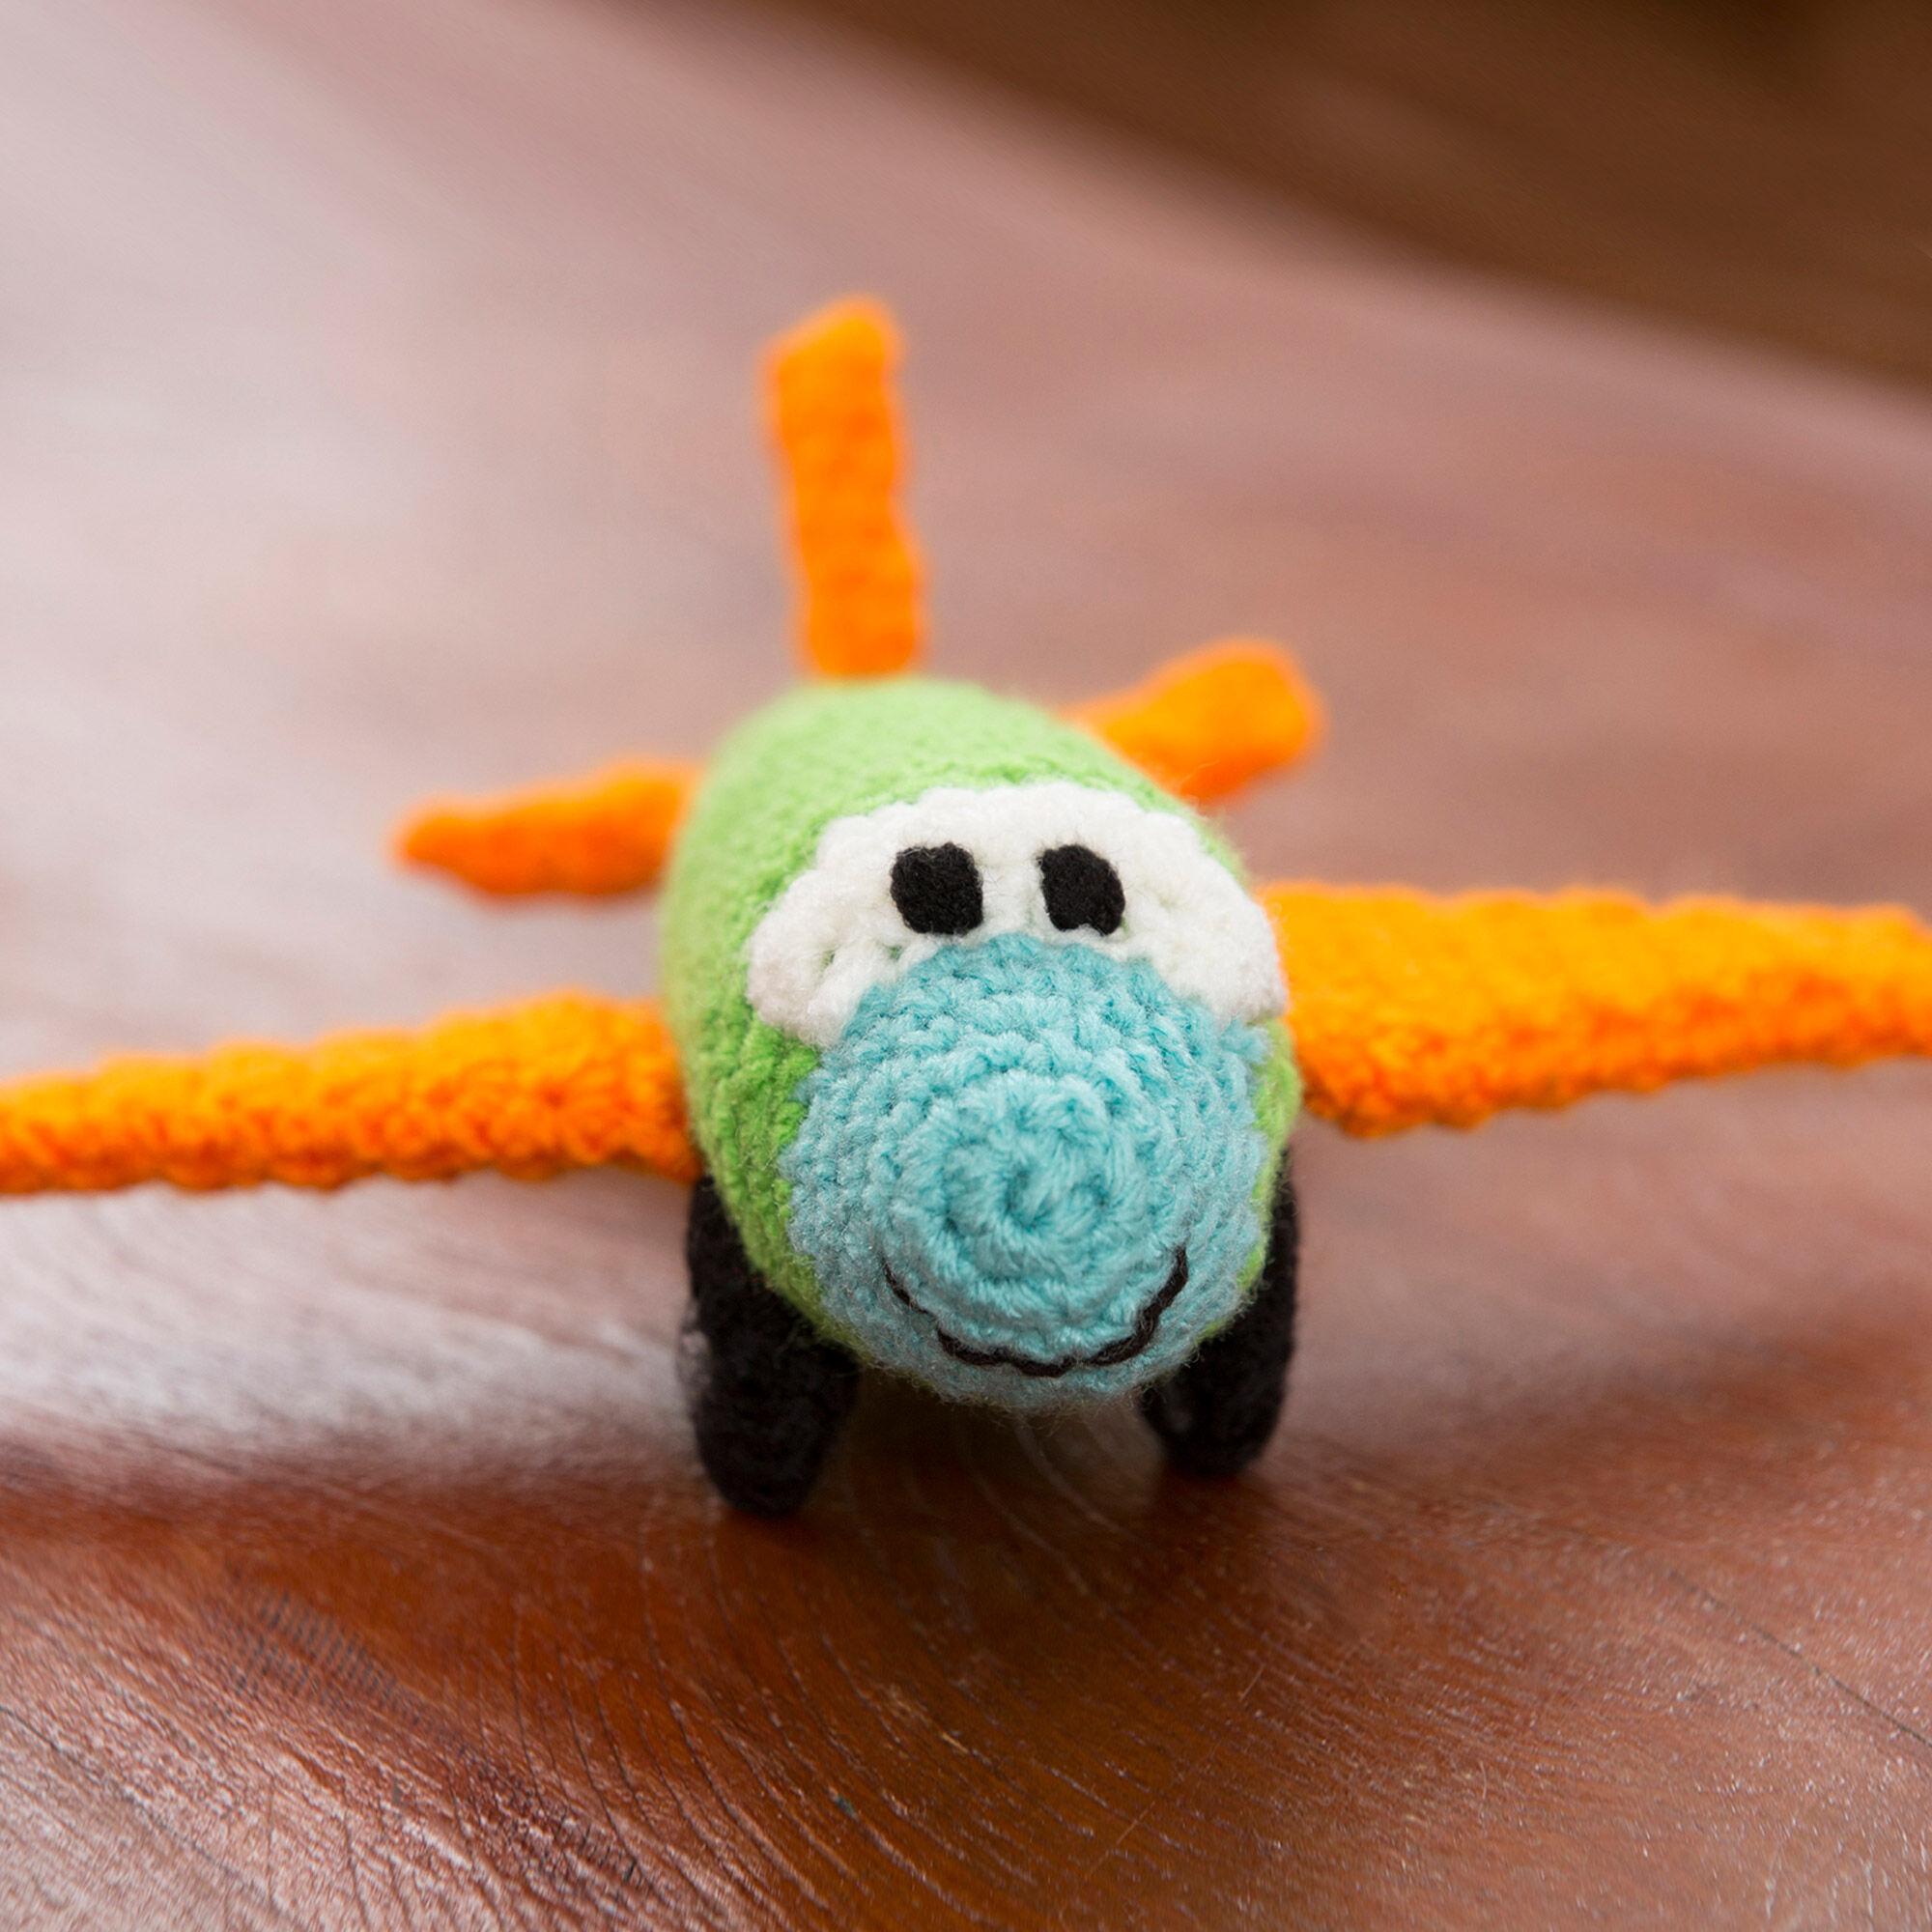 Crochet Airplane Amigurumi Free Patterns | 2000x2000